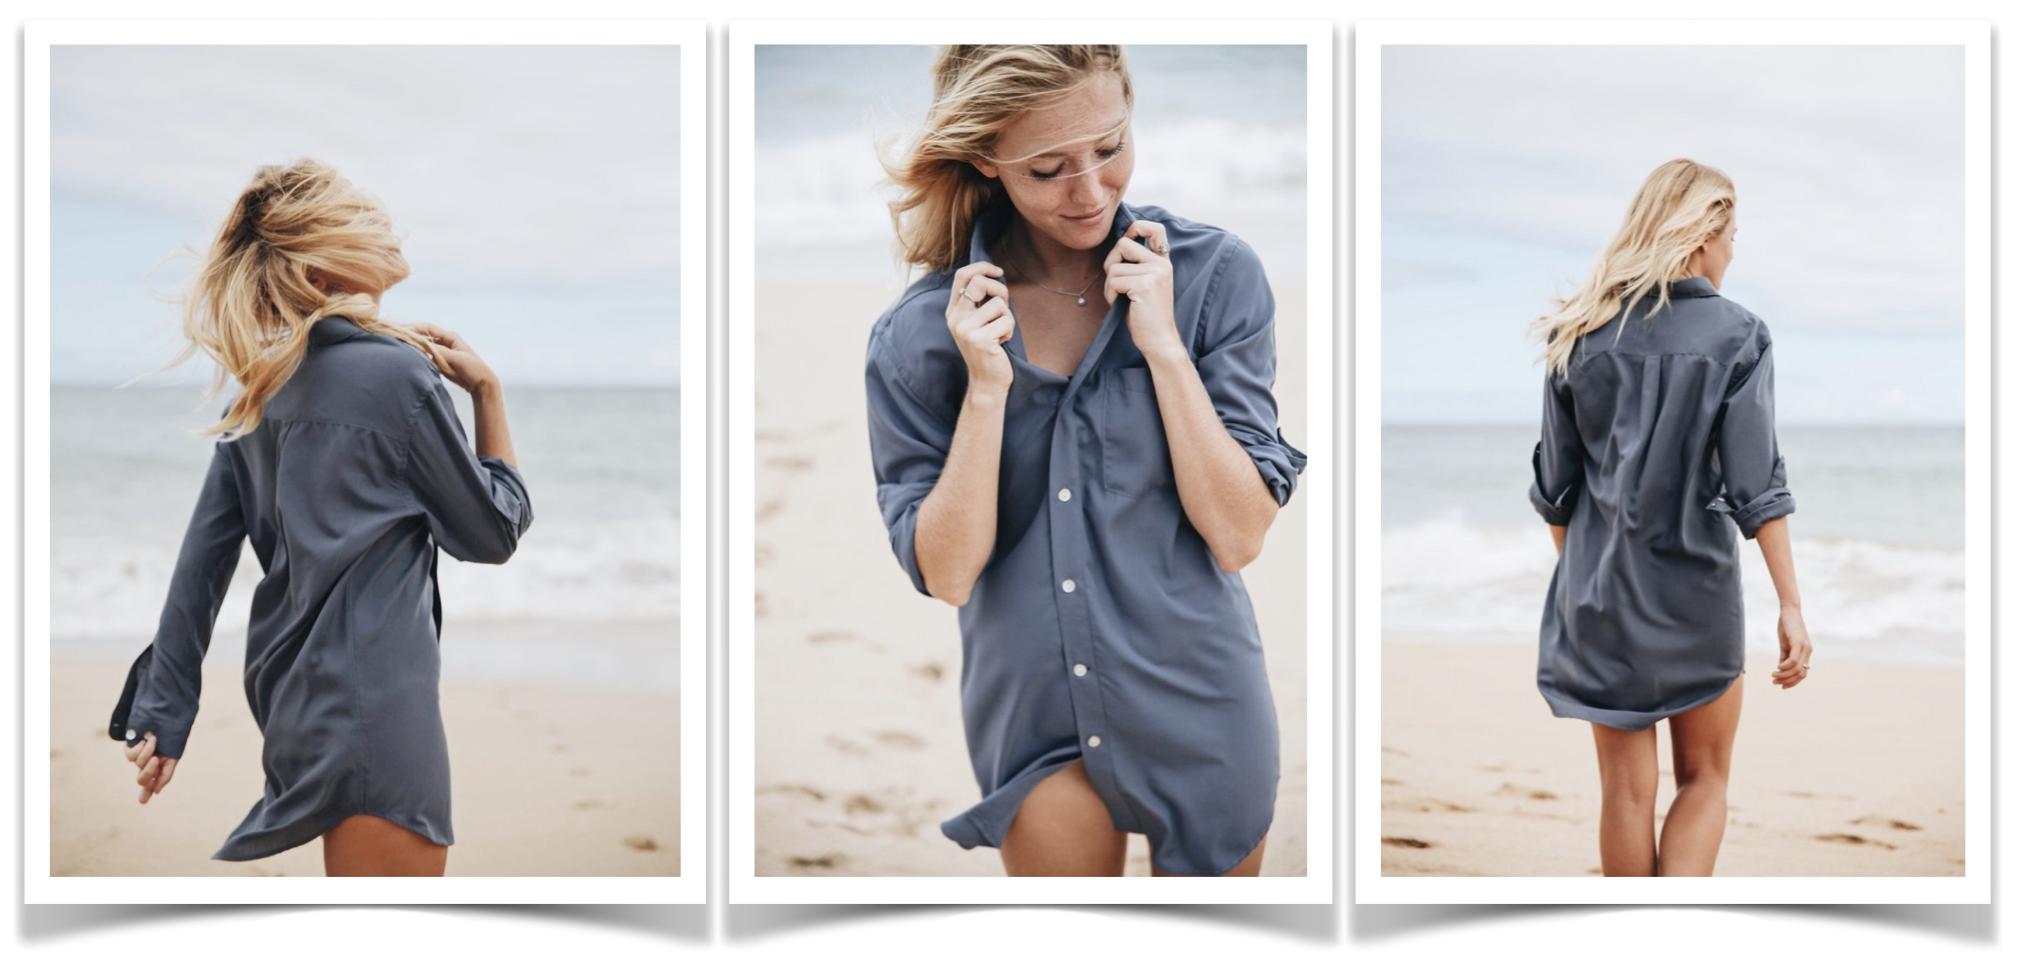 b3e4d50253 Boyfriend Beach Shirt - Maui Surfer Girls